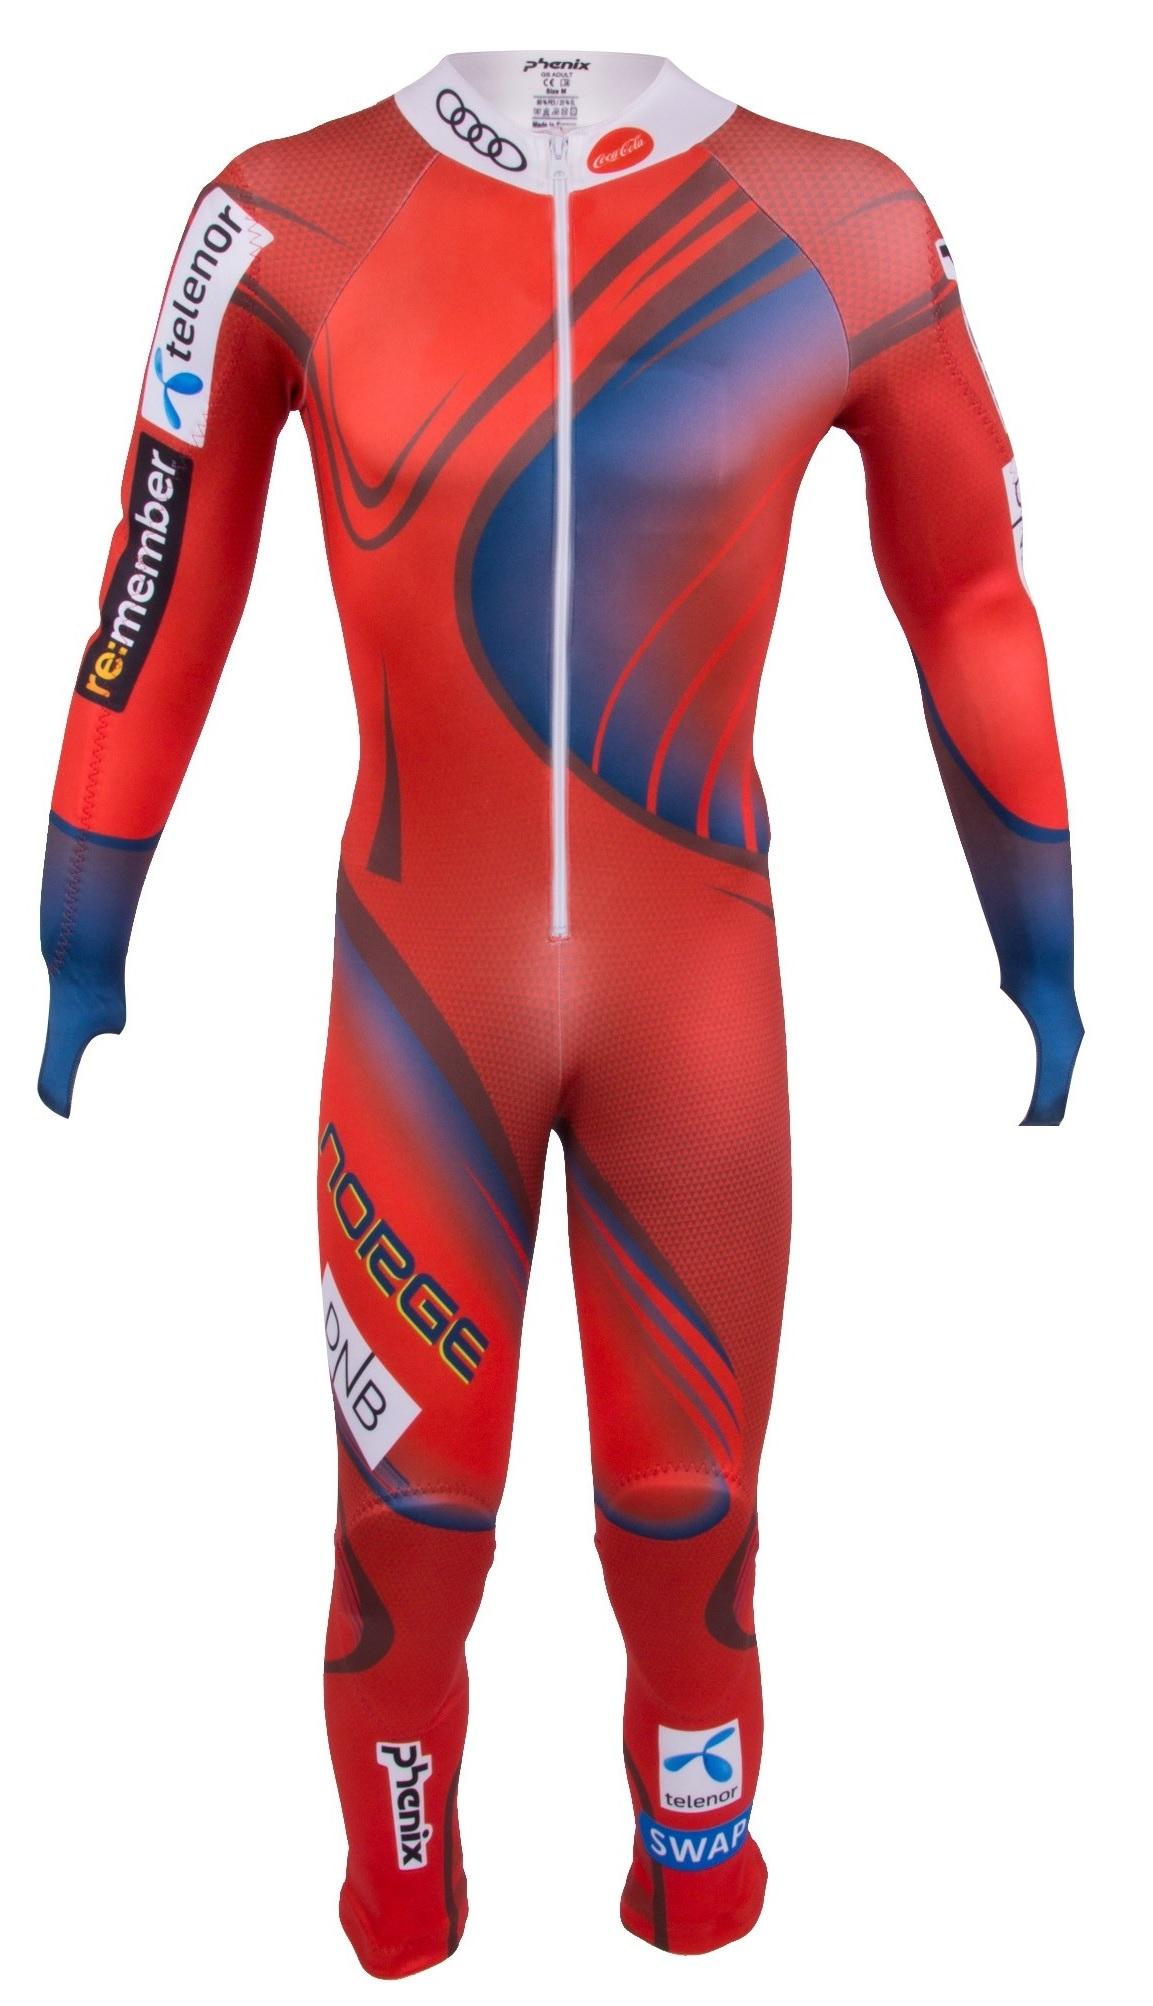 Alpine Ski Race Suits - Ski Racing Gear